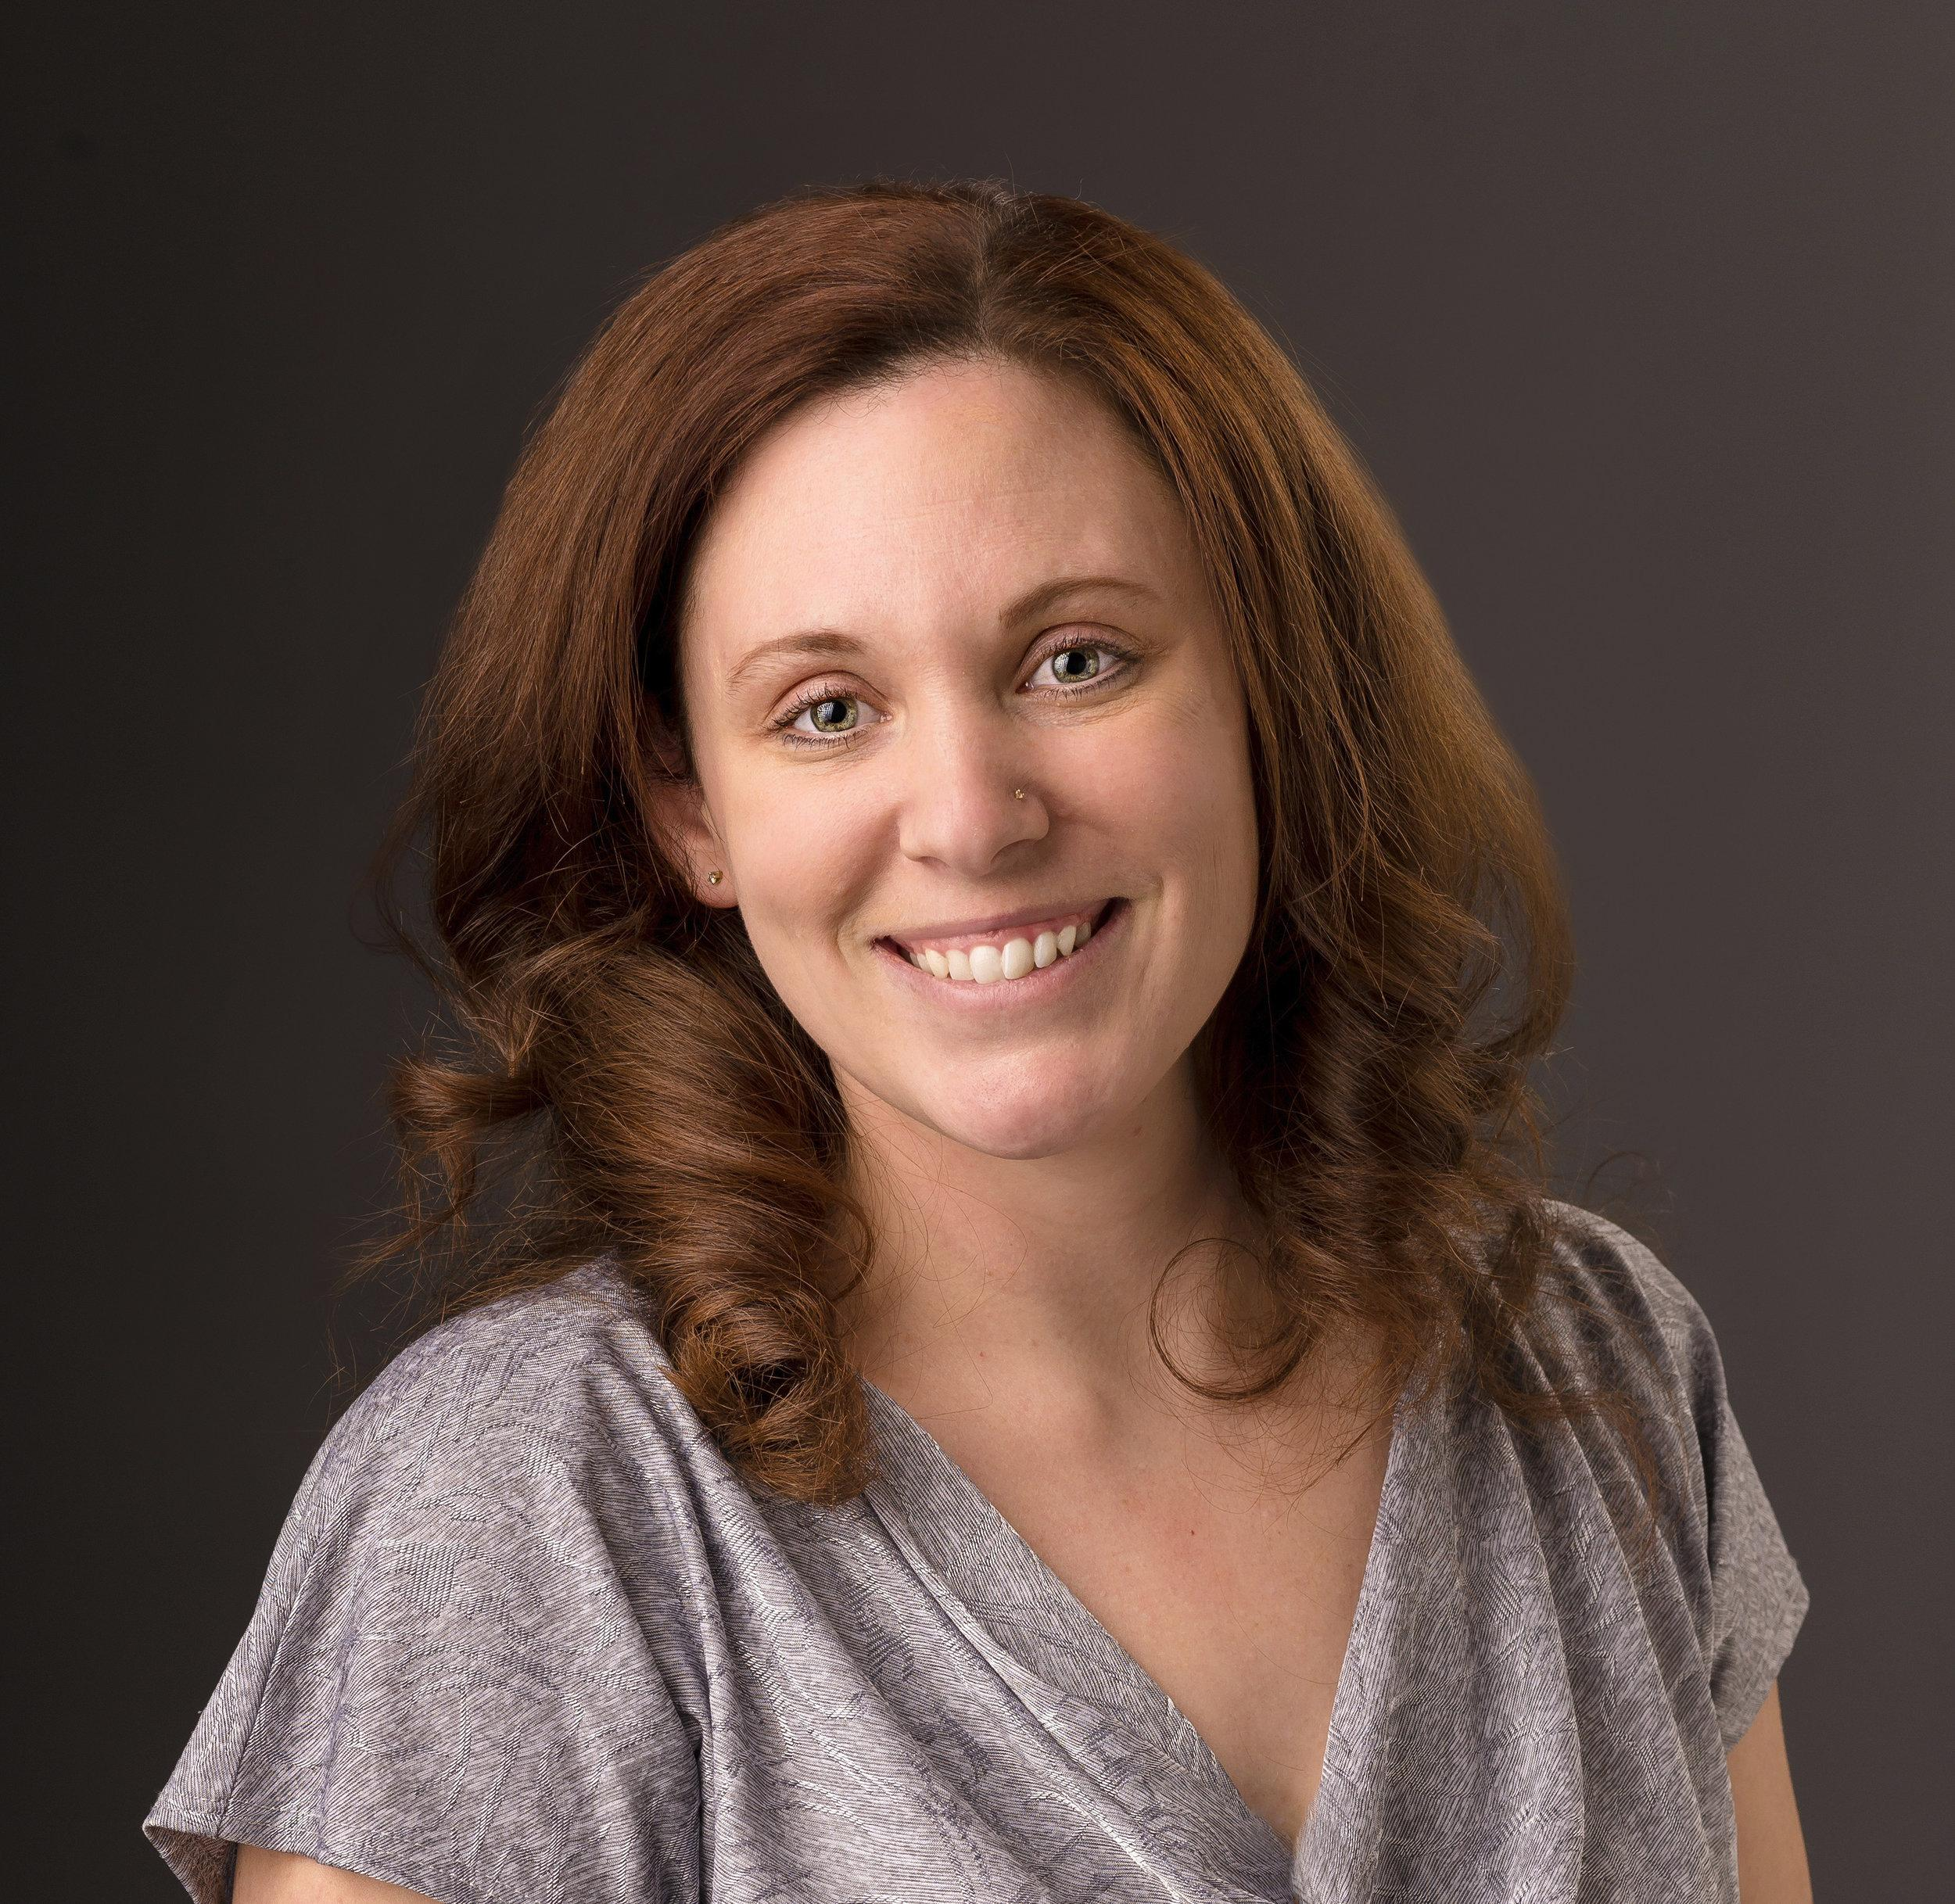 Melanie-Cervo-owner-professional-photographer